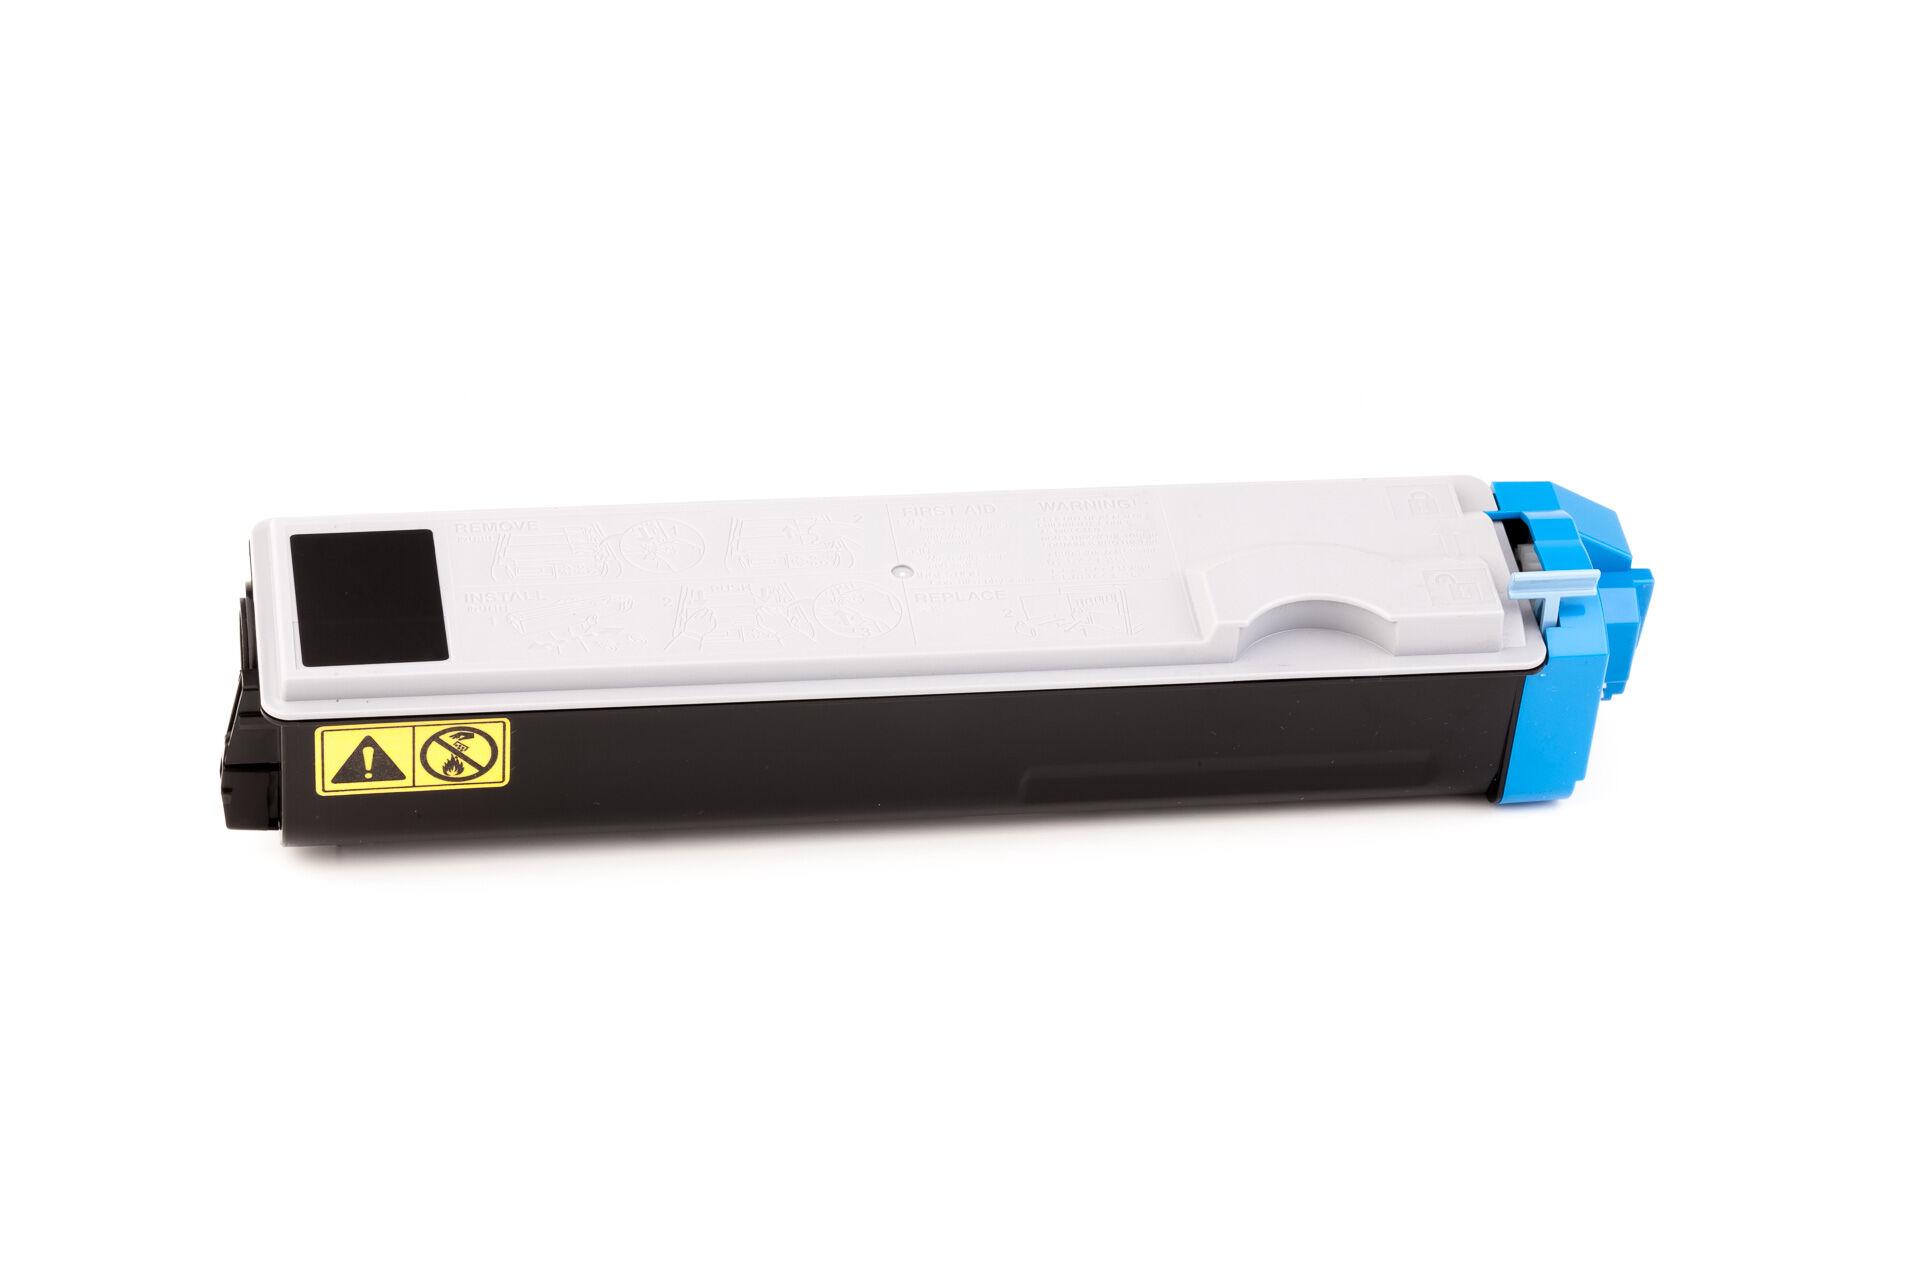 Kyocera Cartouche de Toner pour Kyocera 1T02HJCEU0 / TK-520 C cyan compatible (de marque ASC)